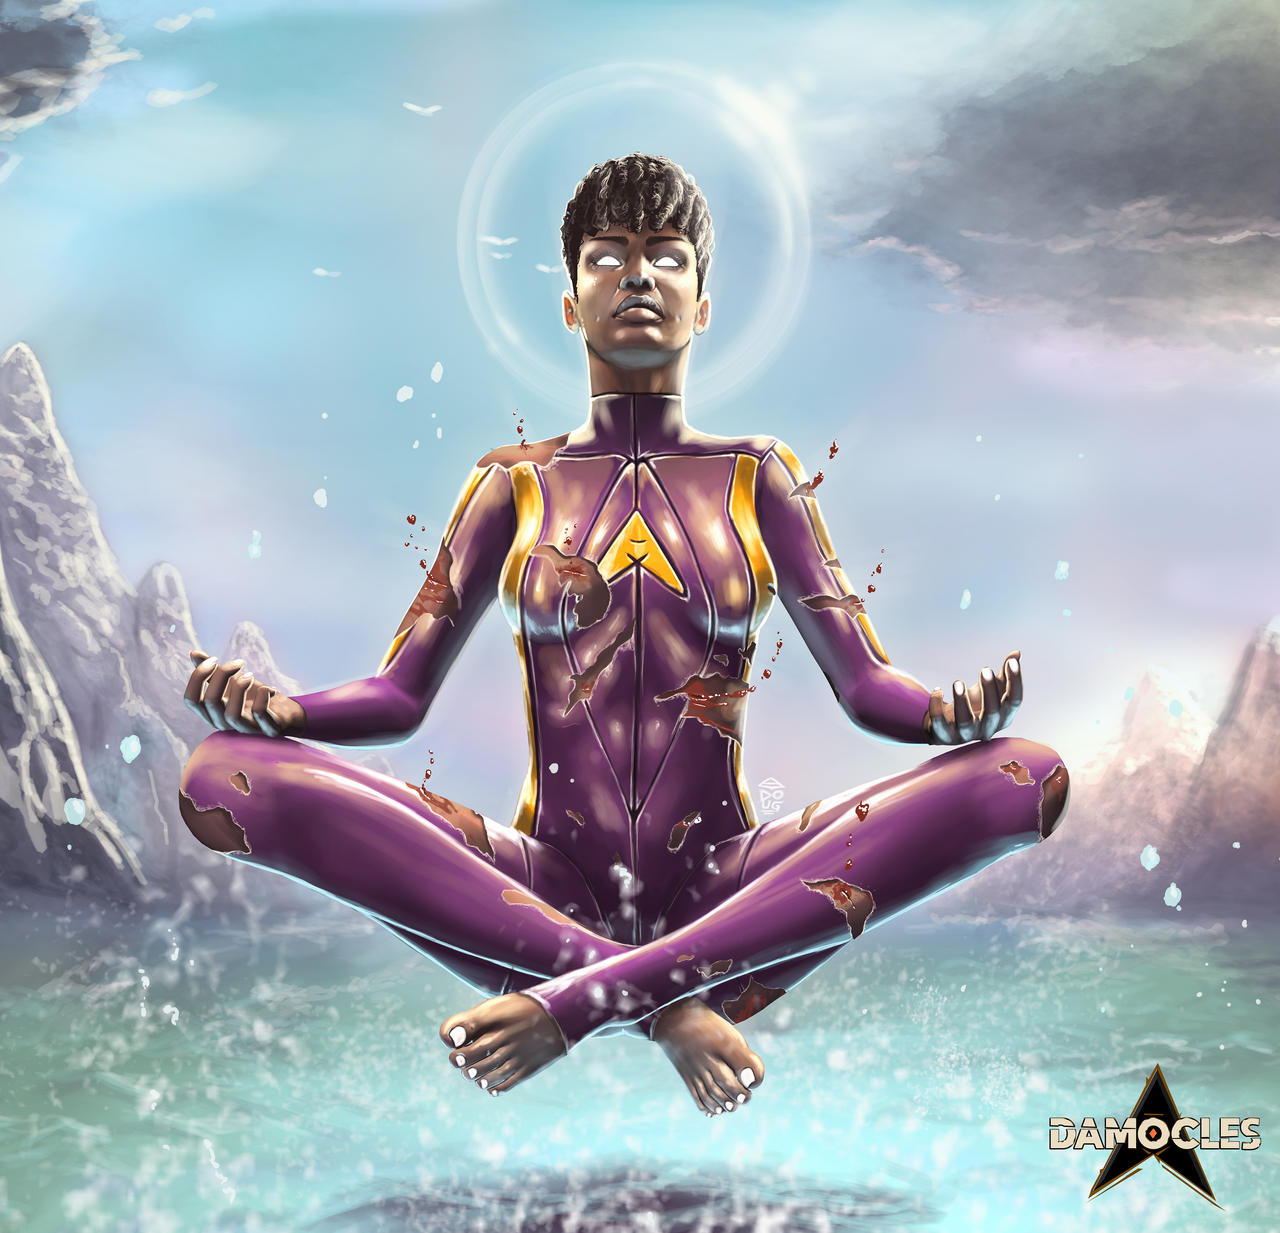 Damocles Meditation